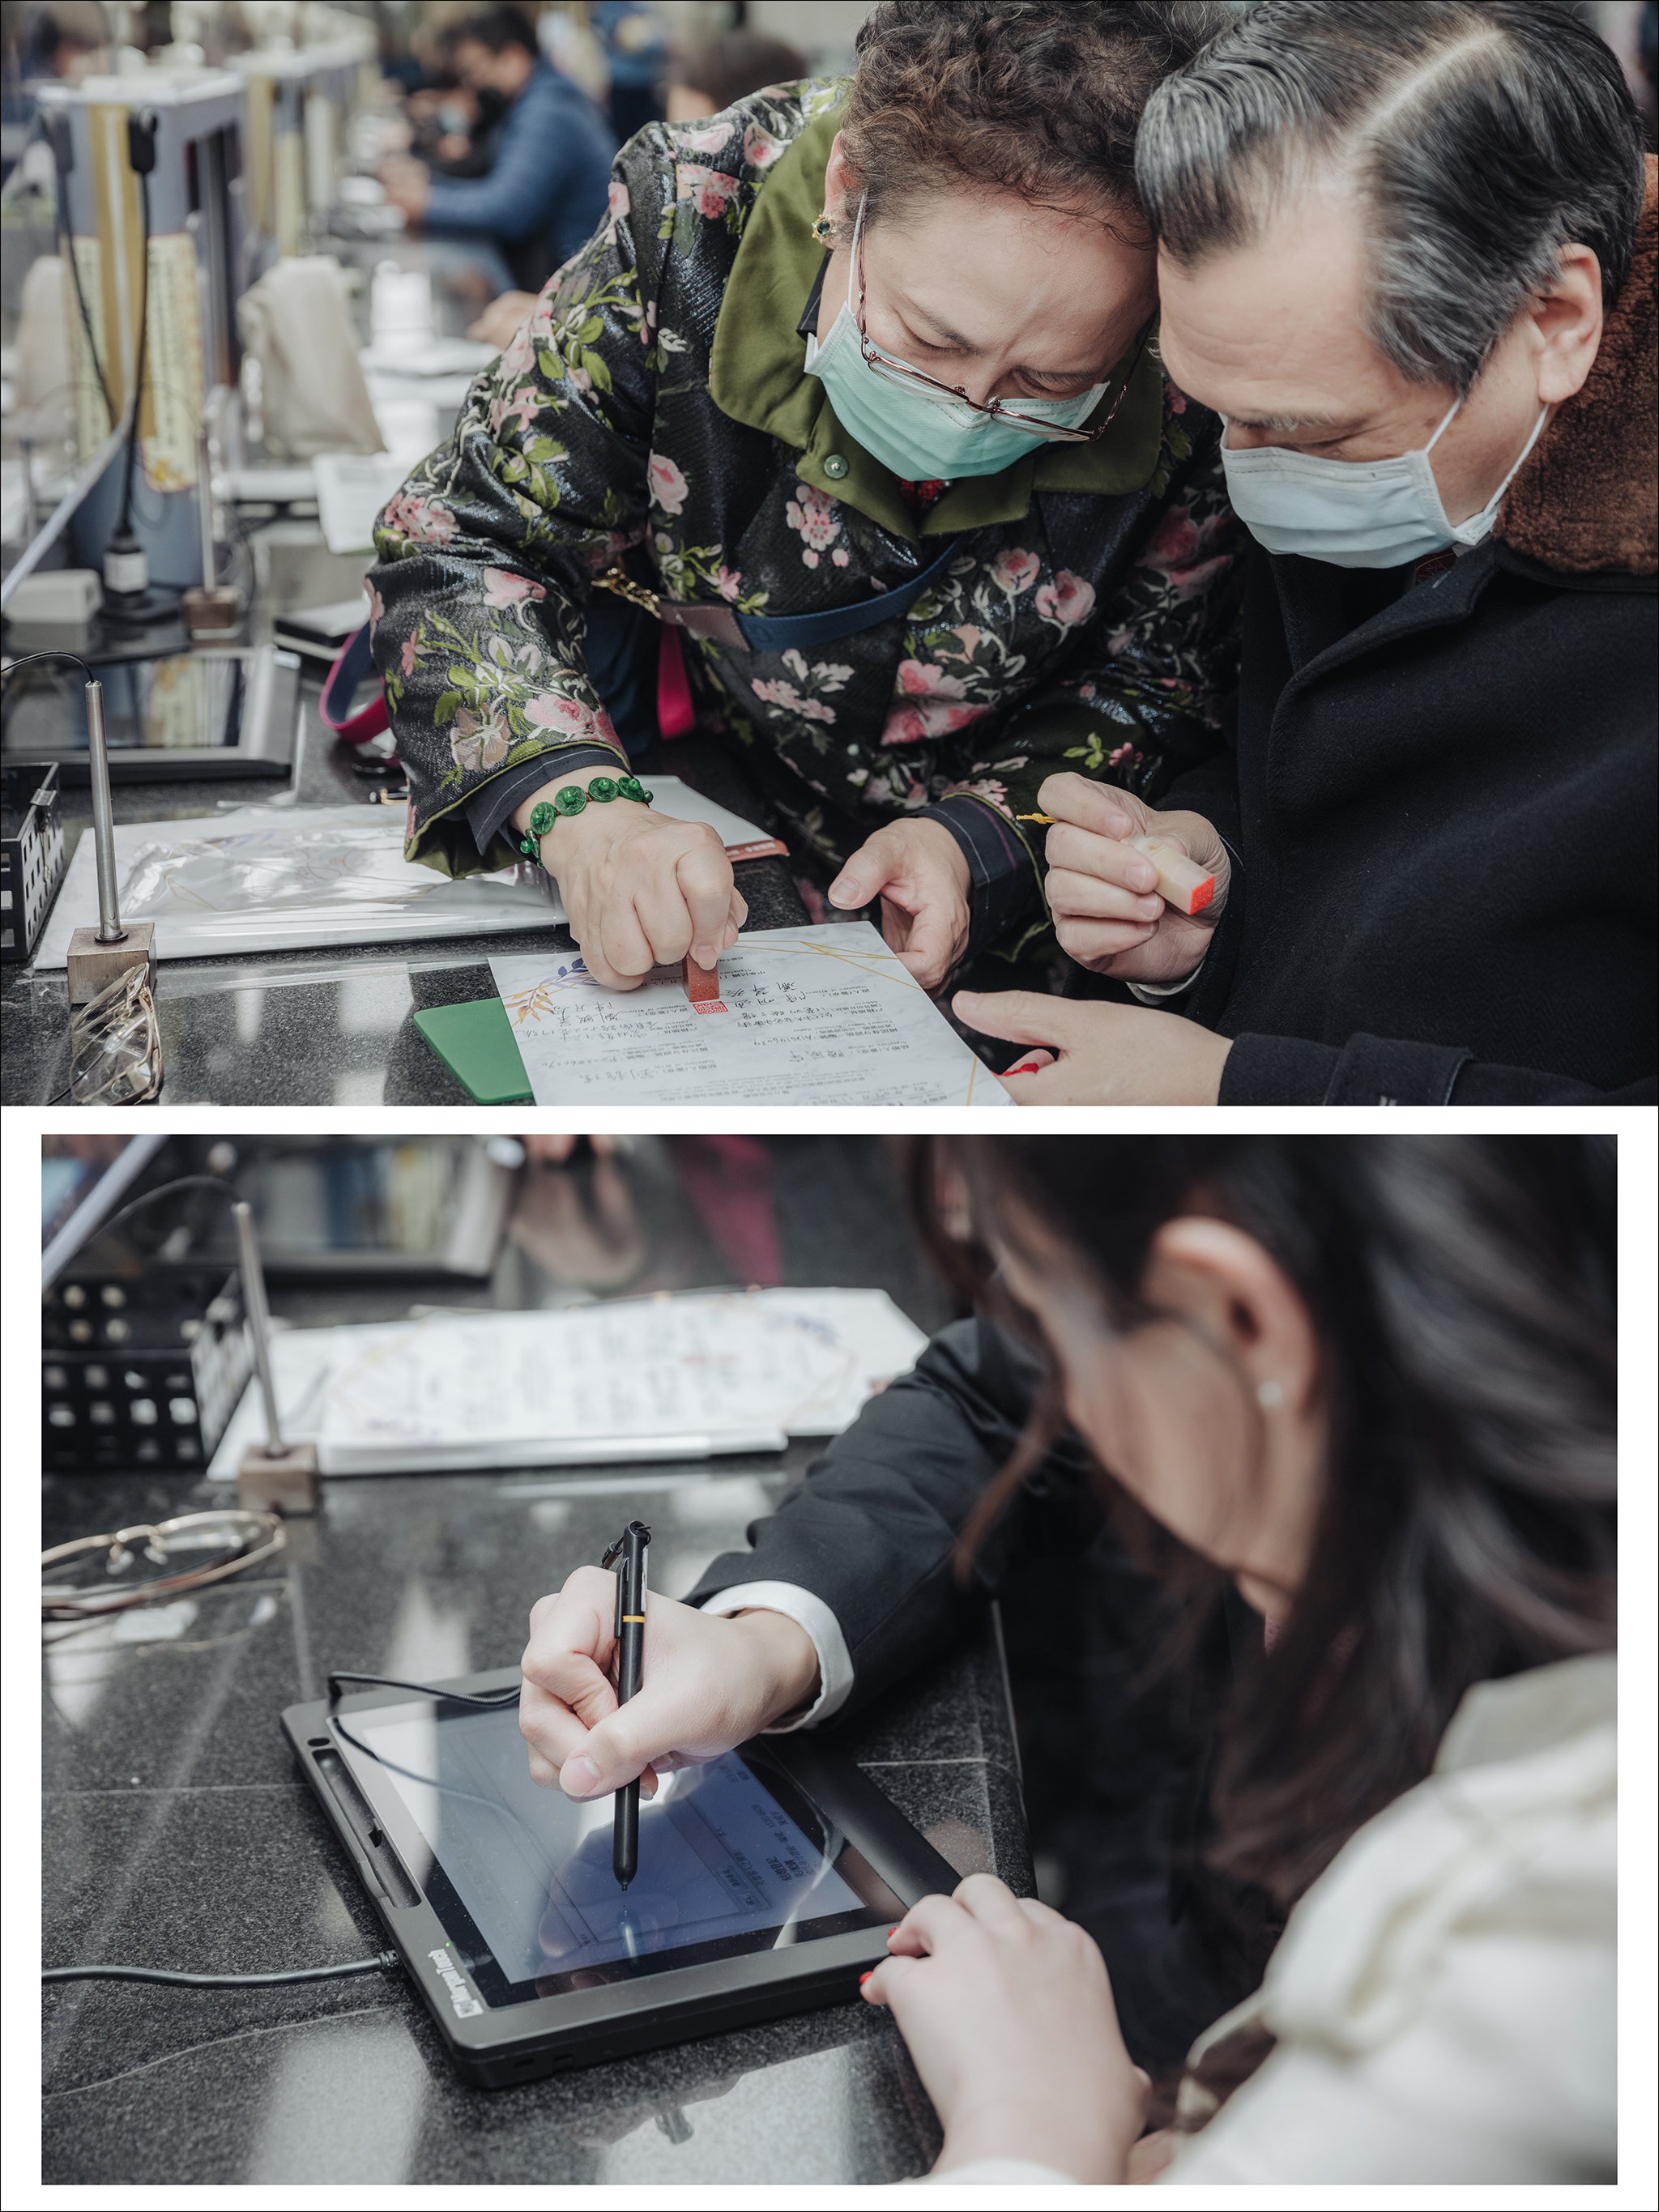 51498199017 2a2b361837 o - 【證婚寫真】+馥瑤&威宇+